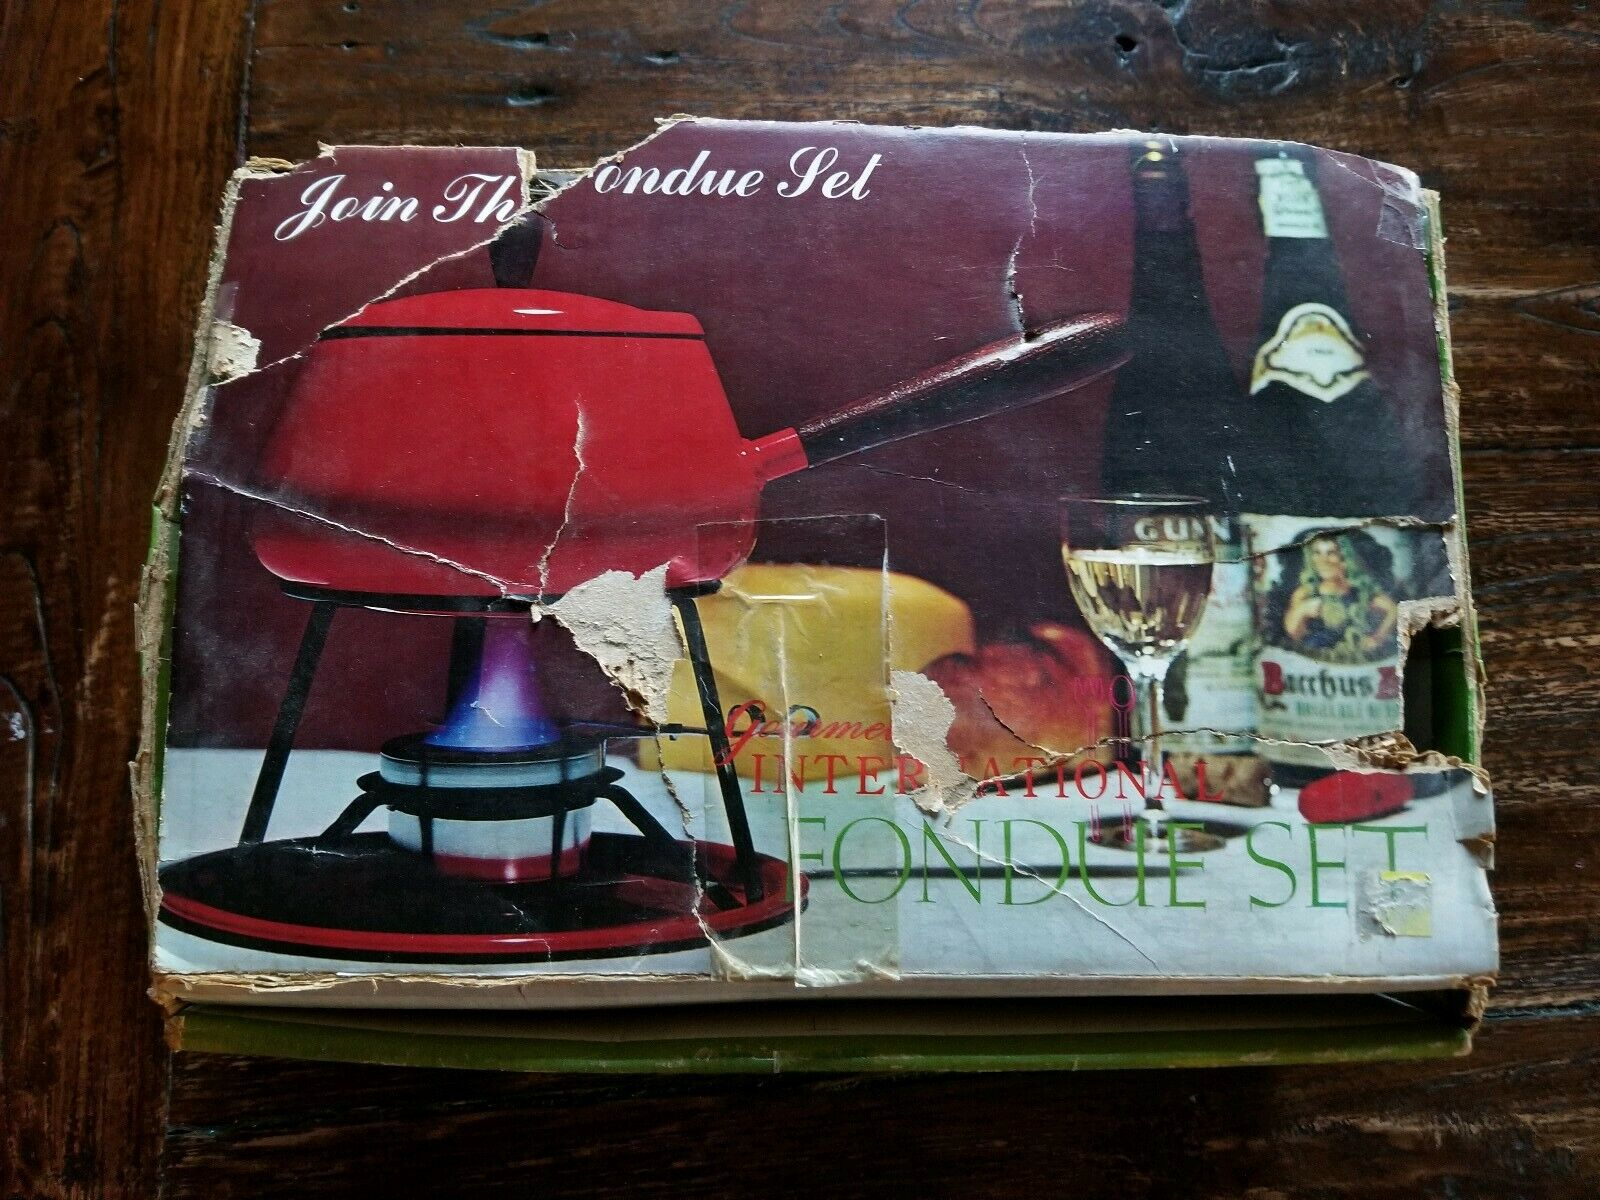 New Vintage Gourmet International Fondue Set - Yellow